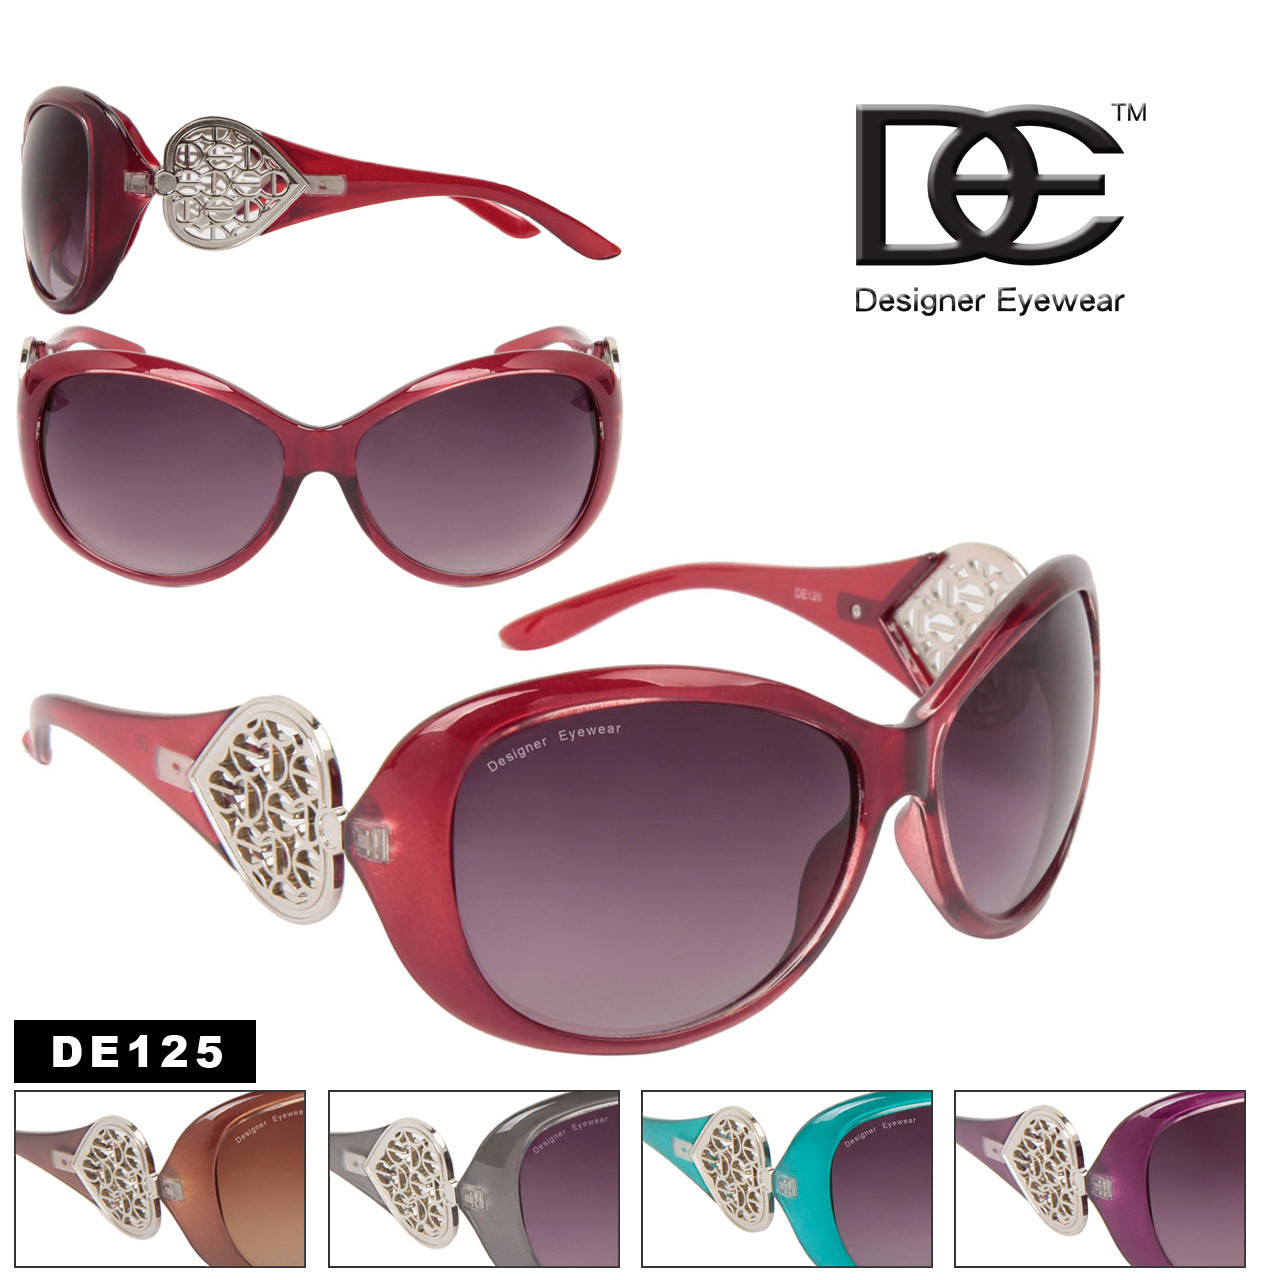 Fashion Sunglasses by Designer Eyewear DE125